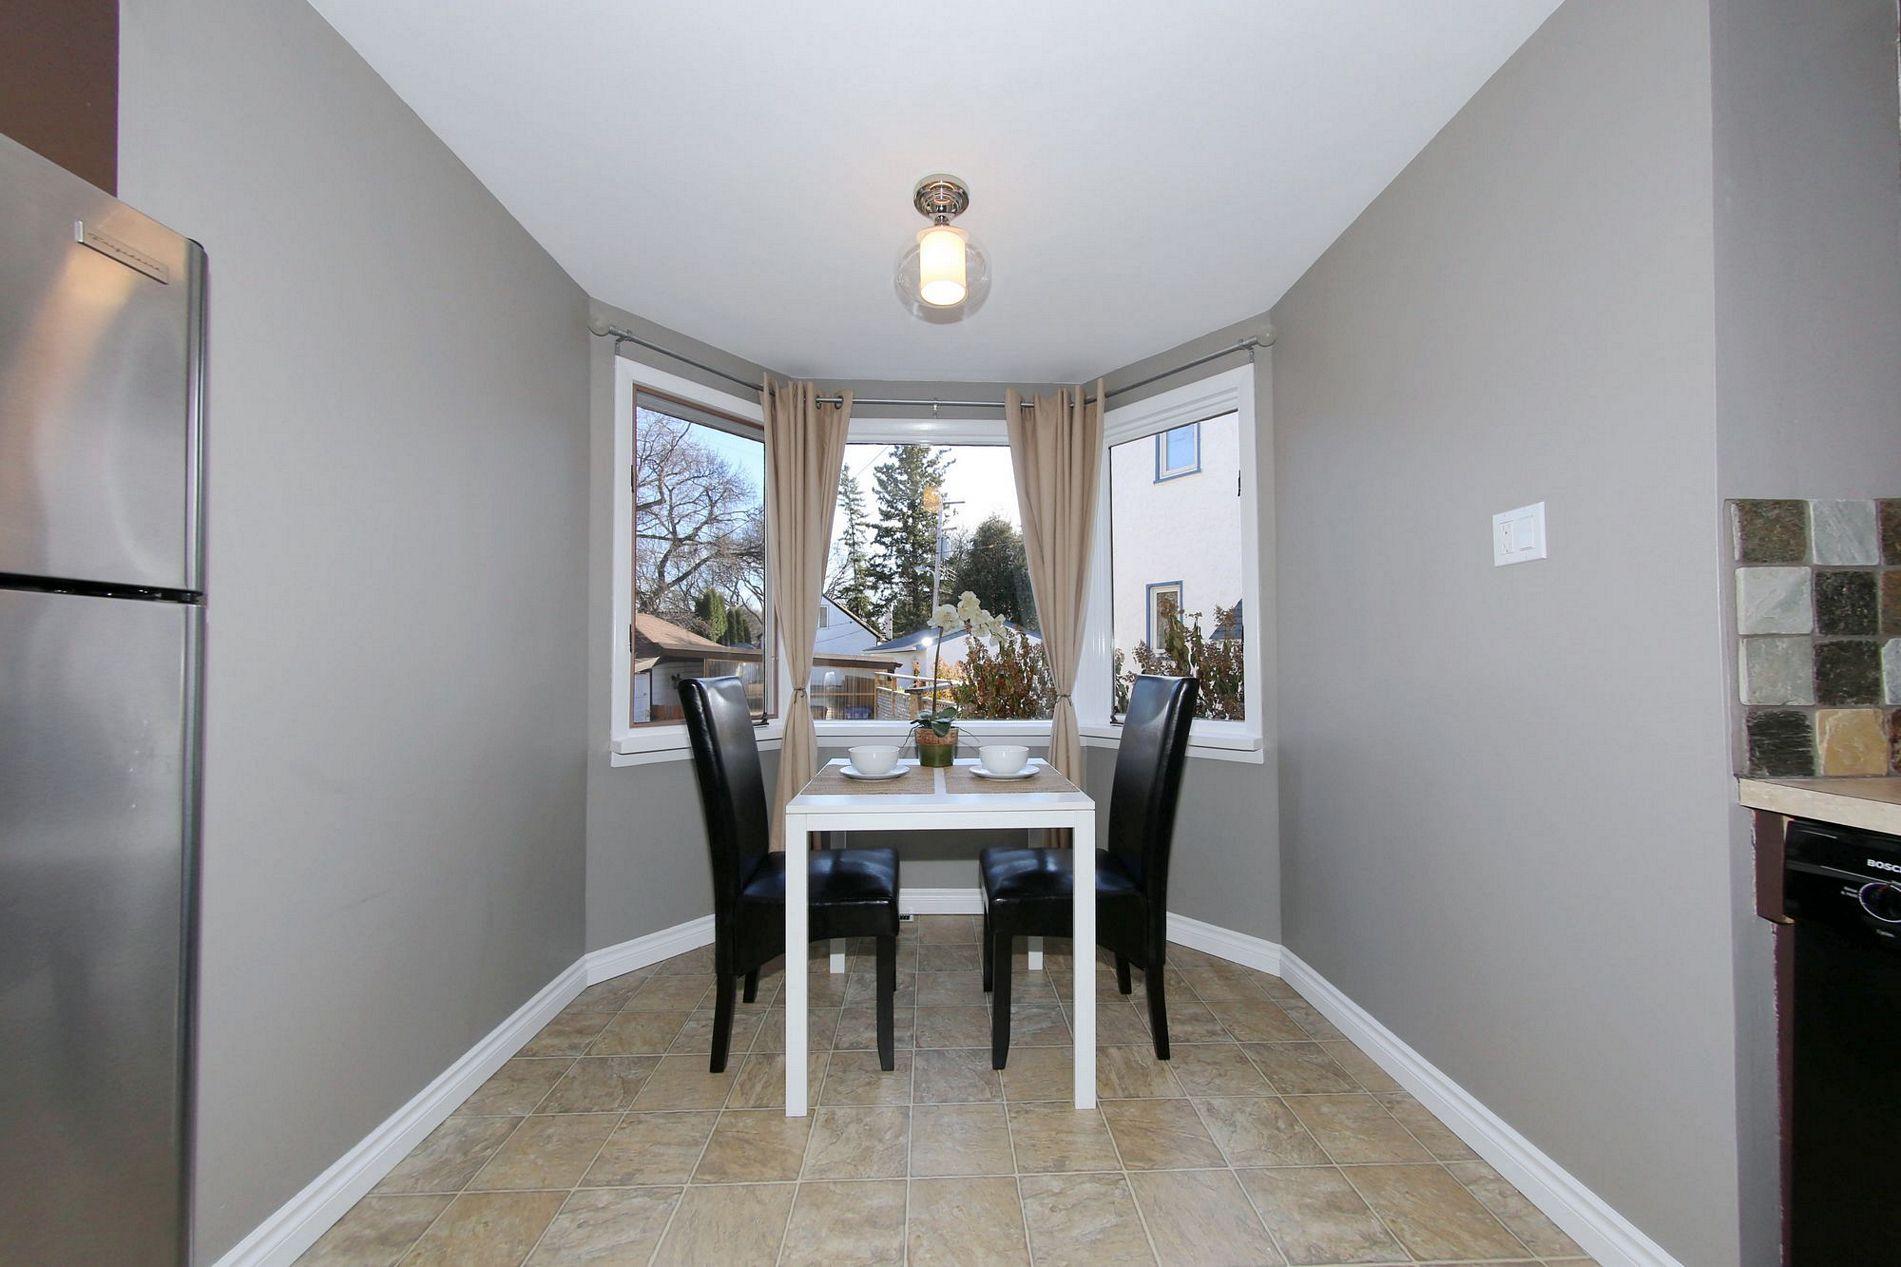 1202 Grosvenor Ave, Winnipeg, Manitoba  R3M 0P1 - Photo 8 - 1728775